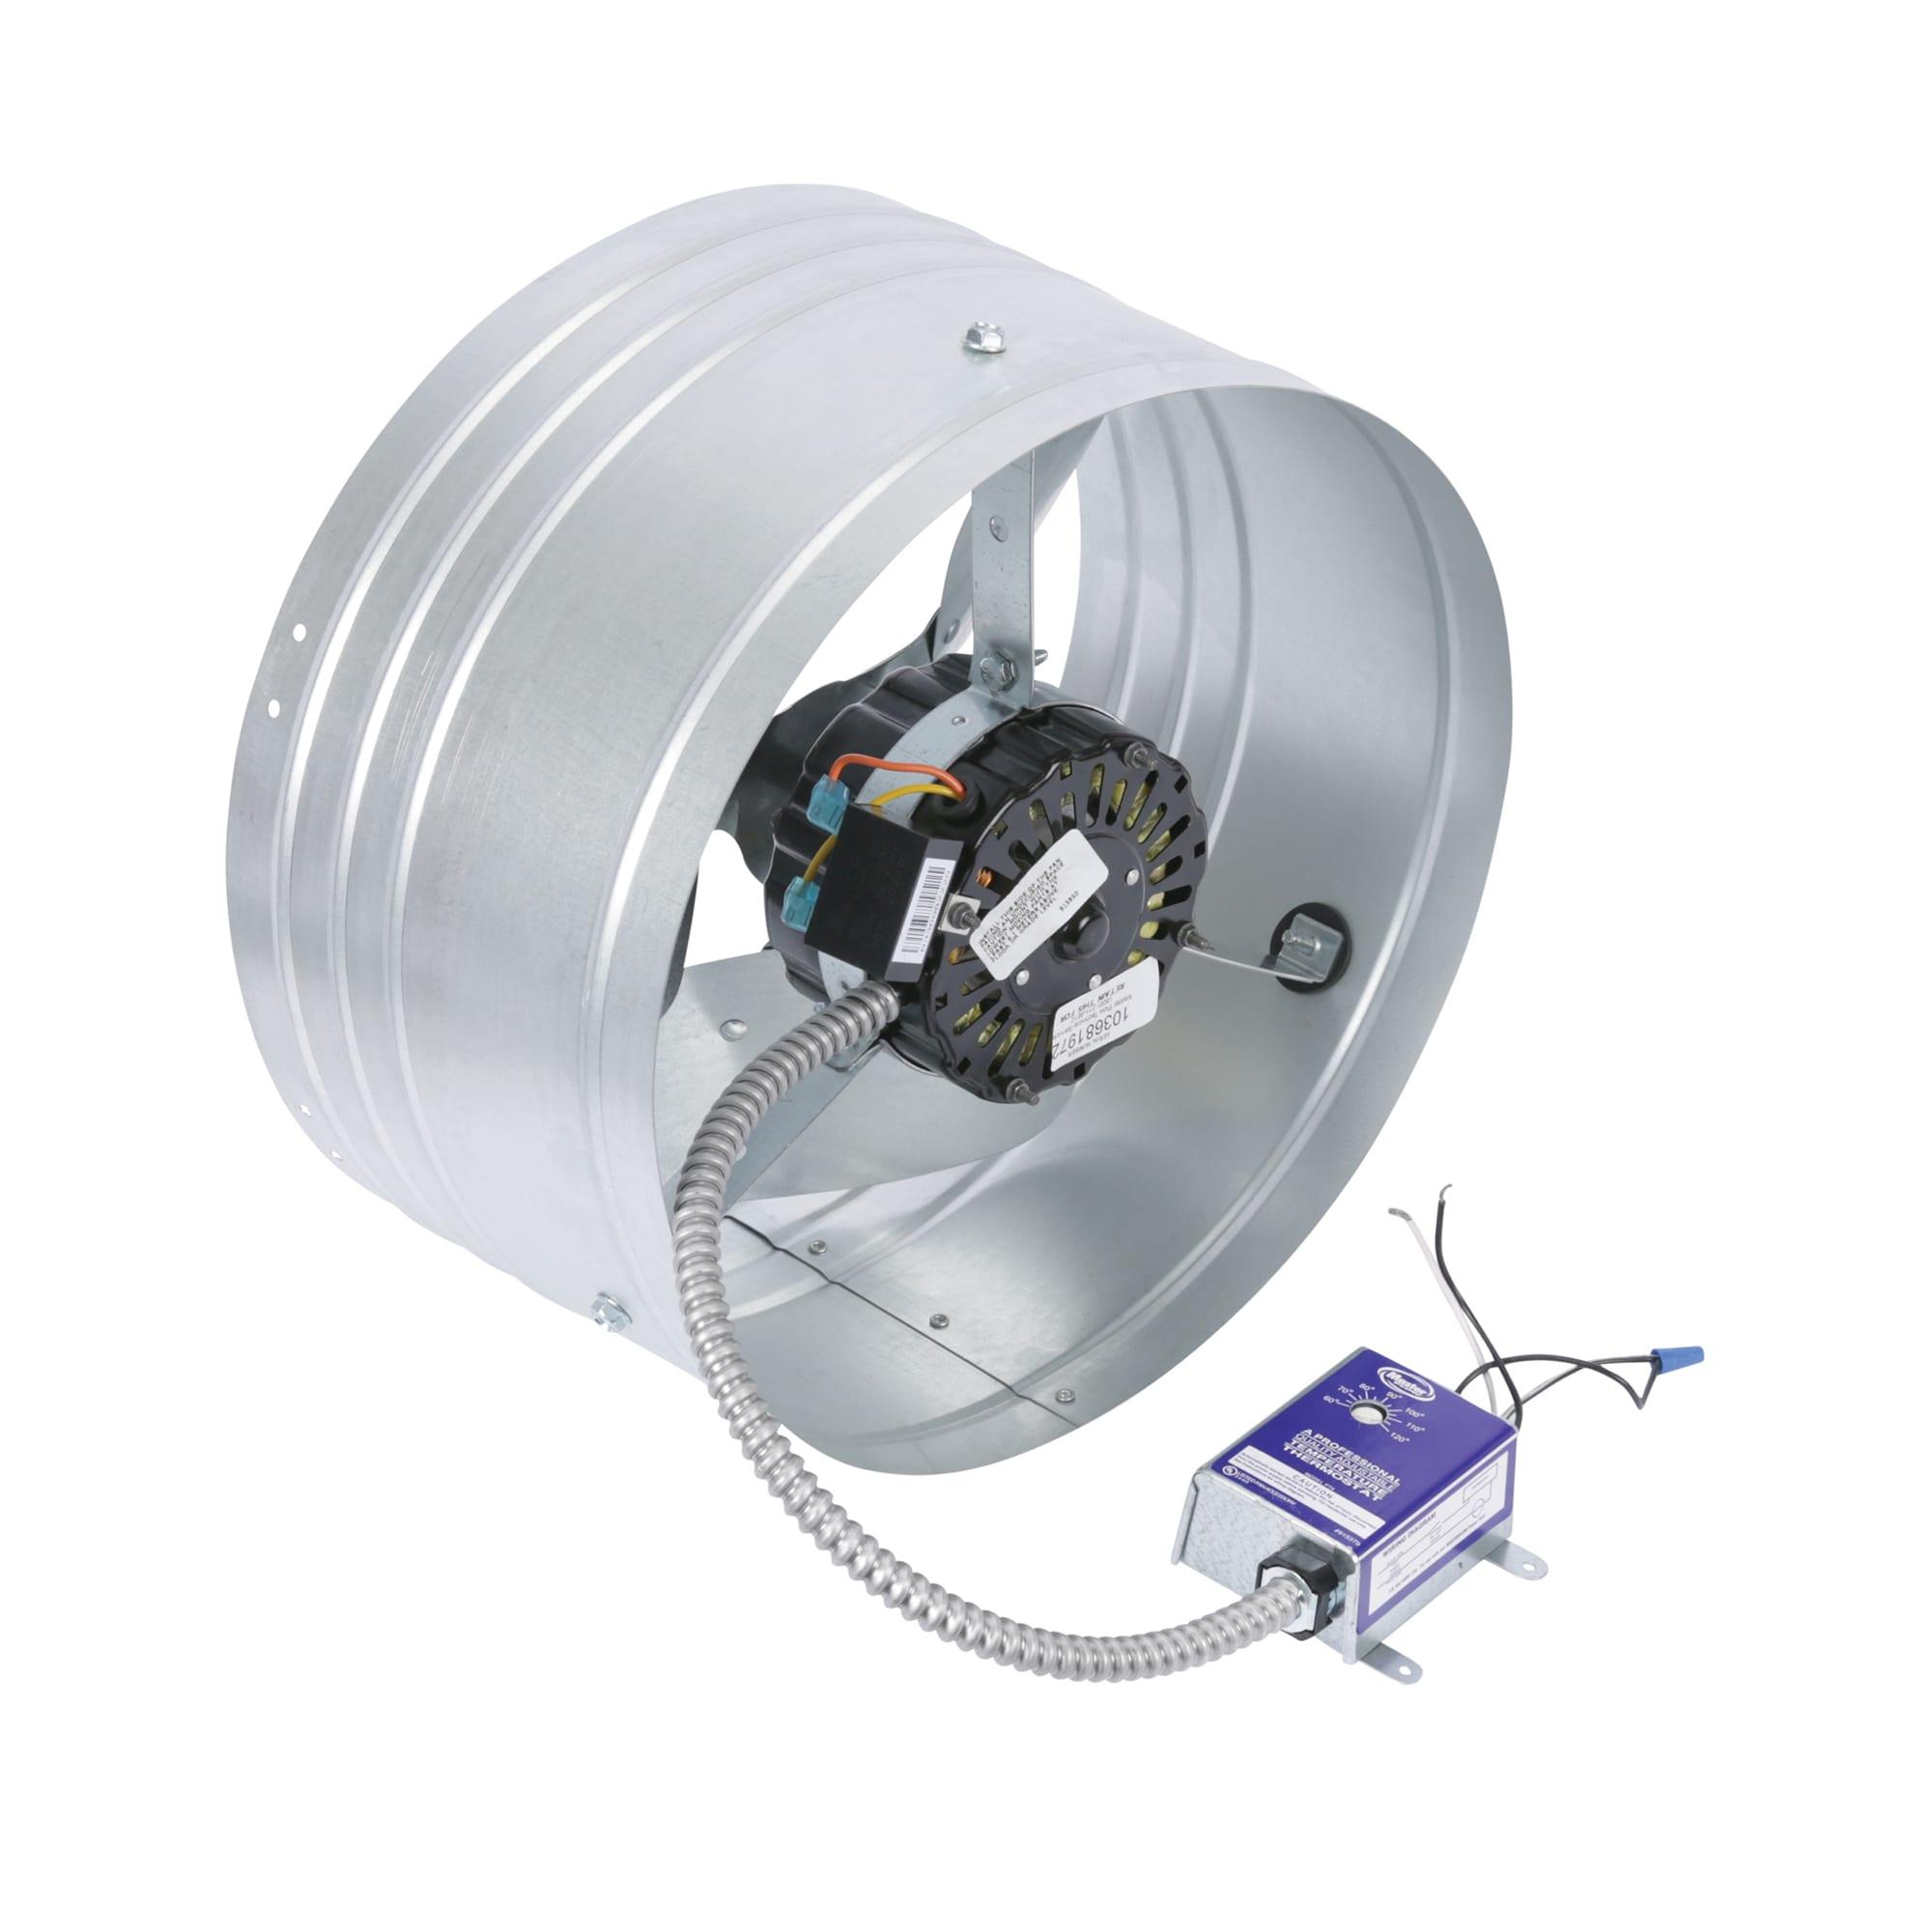 Master Flow Mount Attic Fan Gable High Efficiency Galvanized Steel 1600 CFM